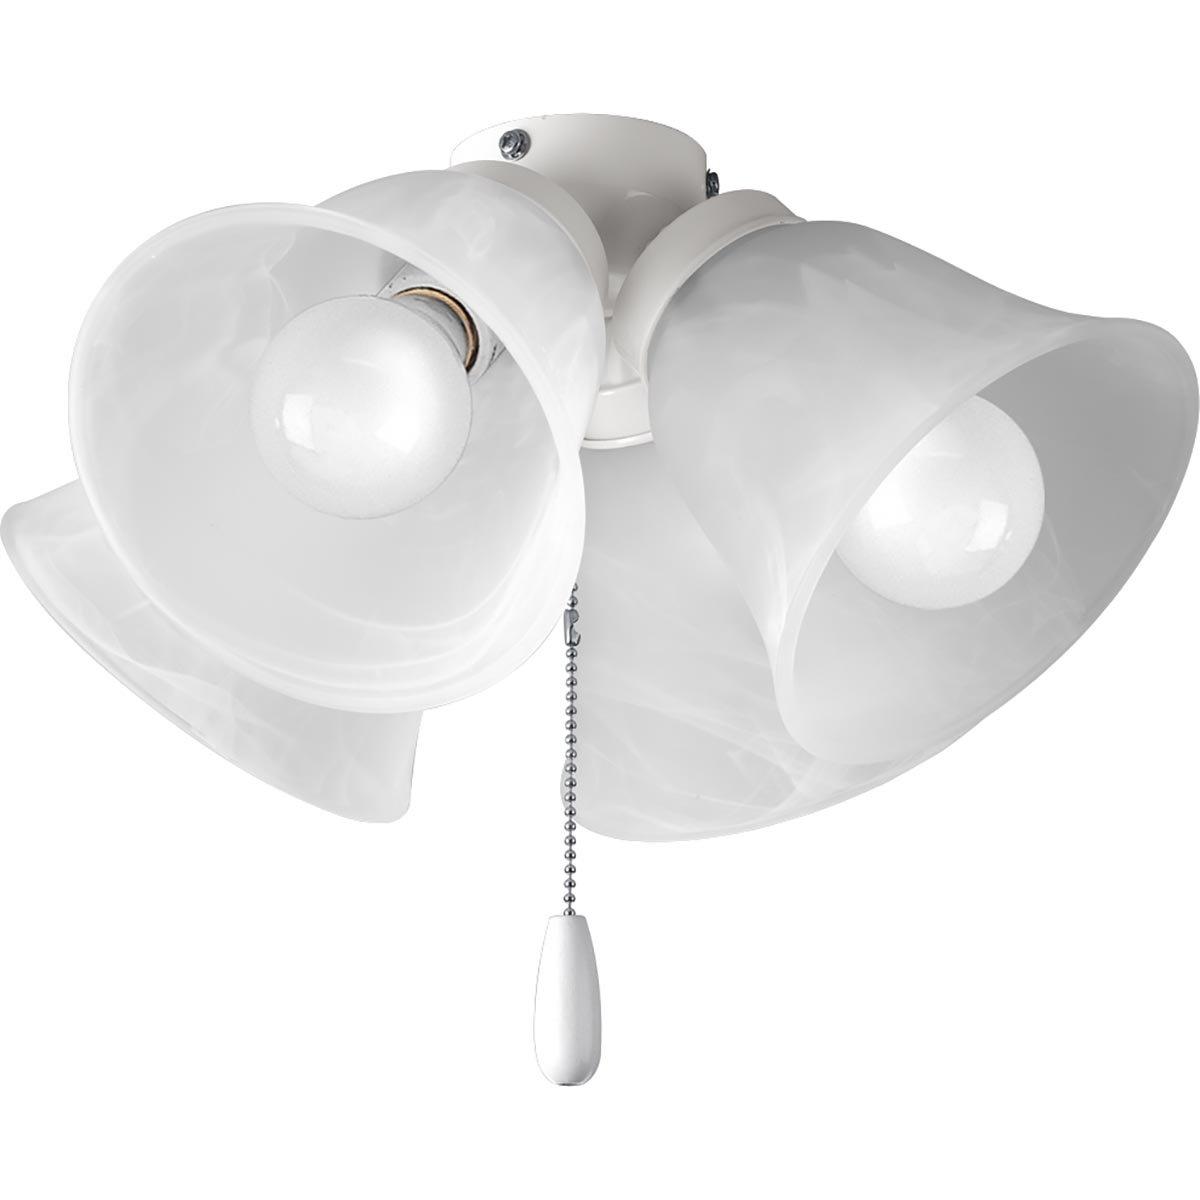 Progress Lighting P2643-30WB Fan Kit, White